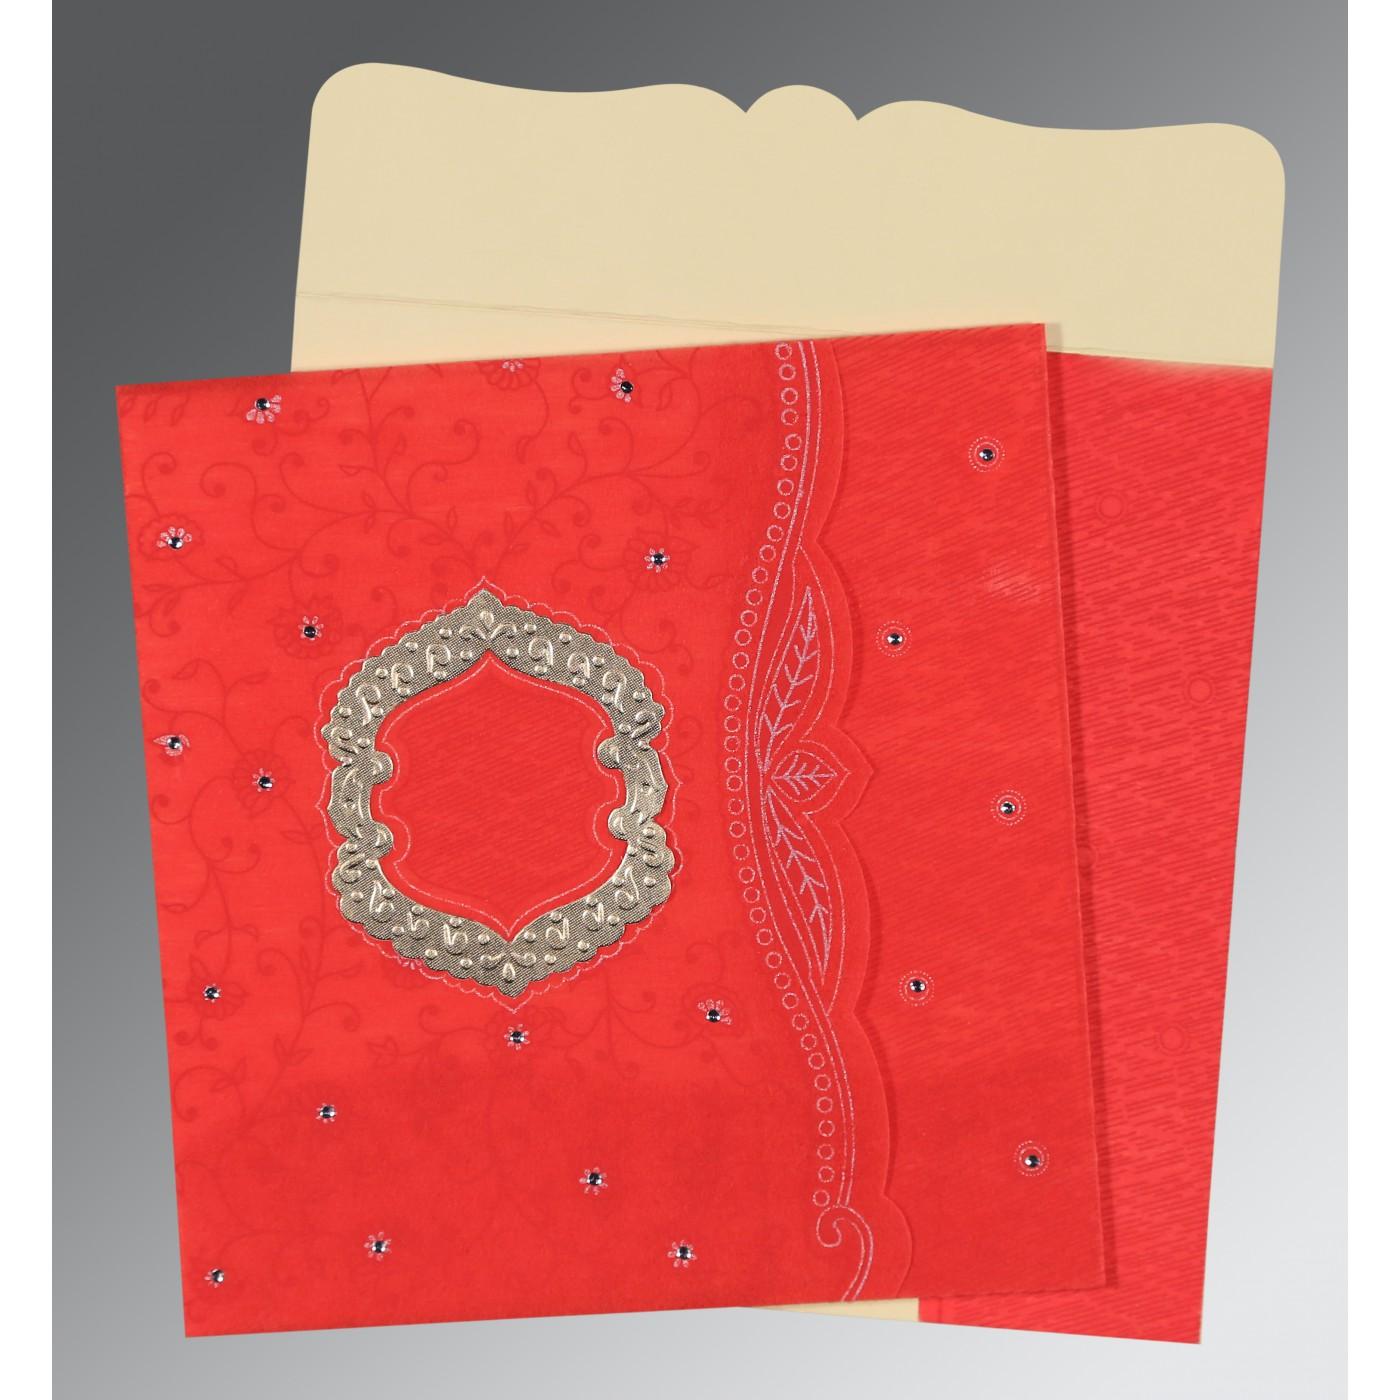 SCARLET SHIMMERY FLORAL THEMED - EMBOSSED WEDDING CARD : D-8209I ...